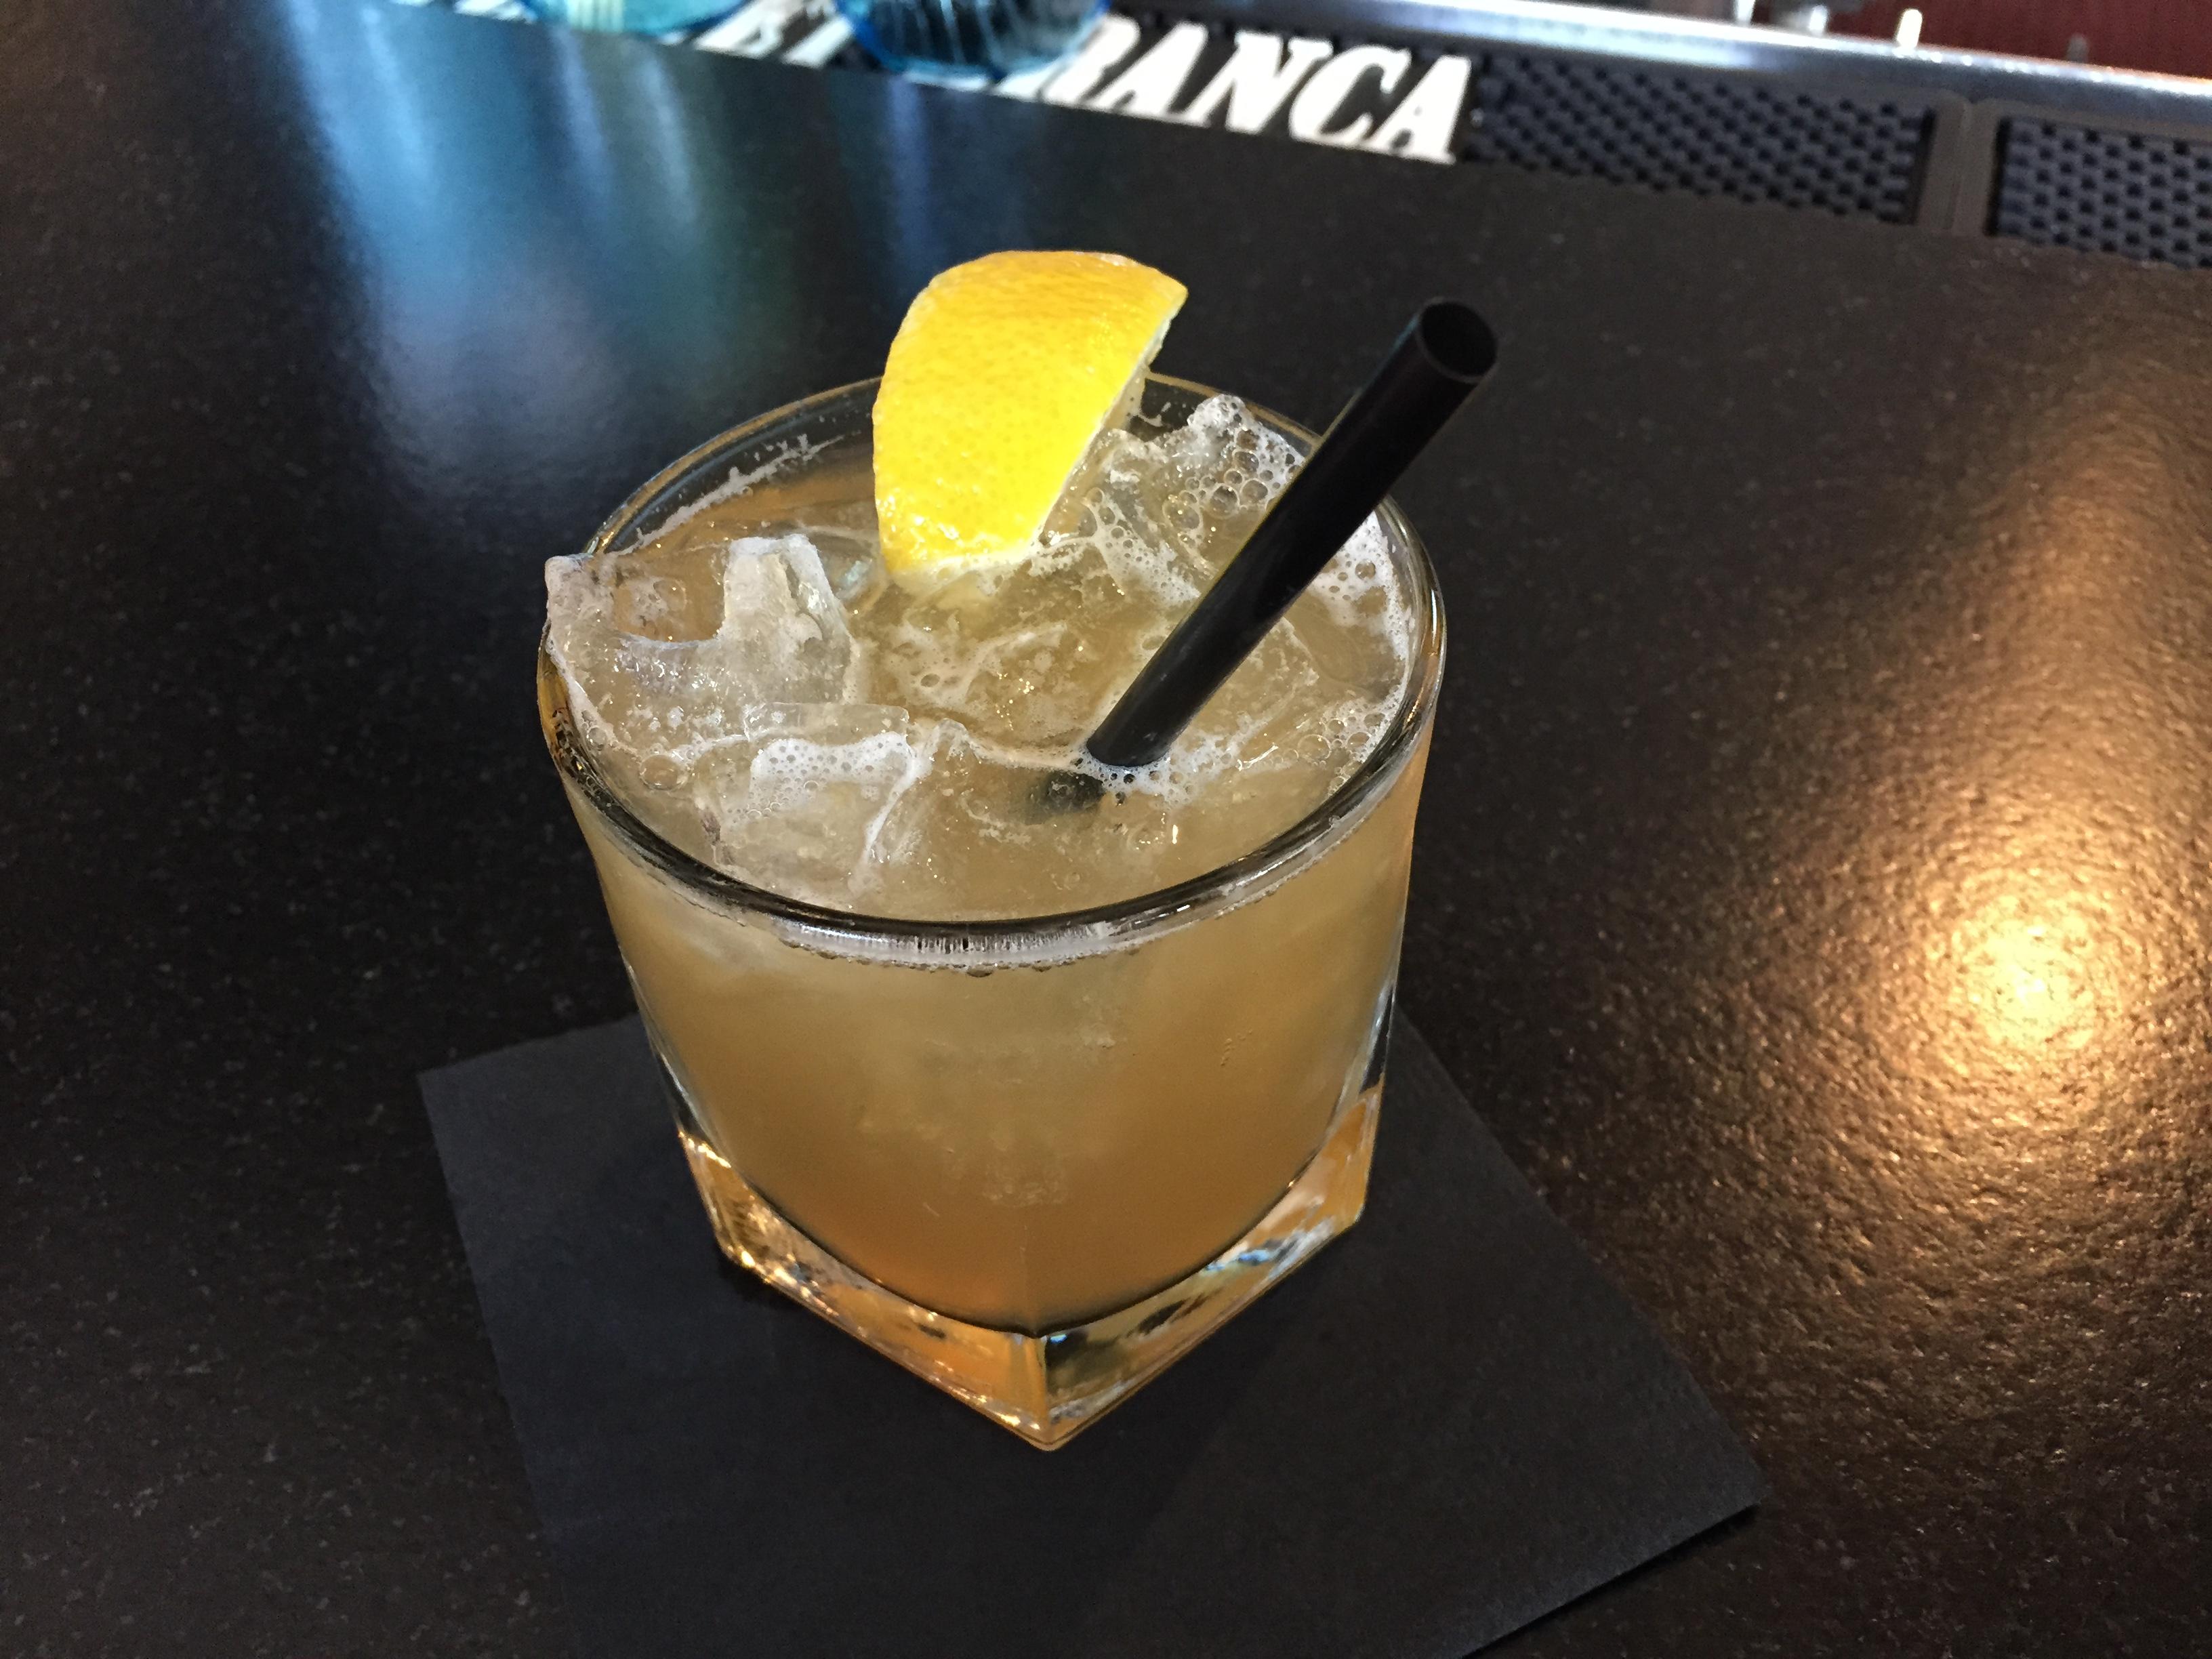 Honey Badger cocktail: too much lemon juice, not enough honey or rye